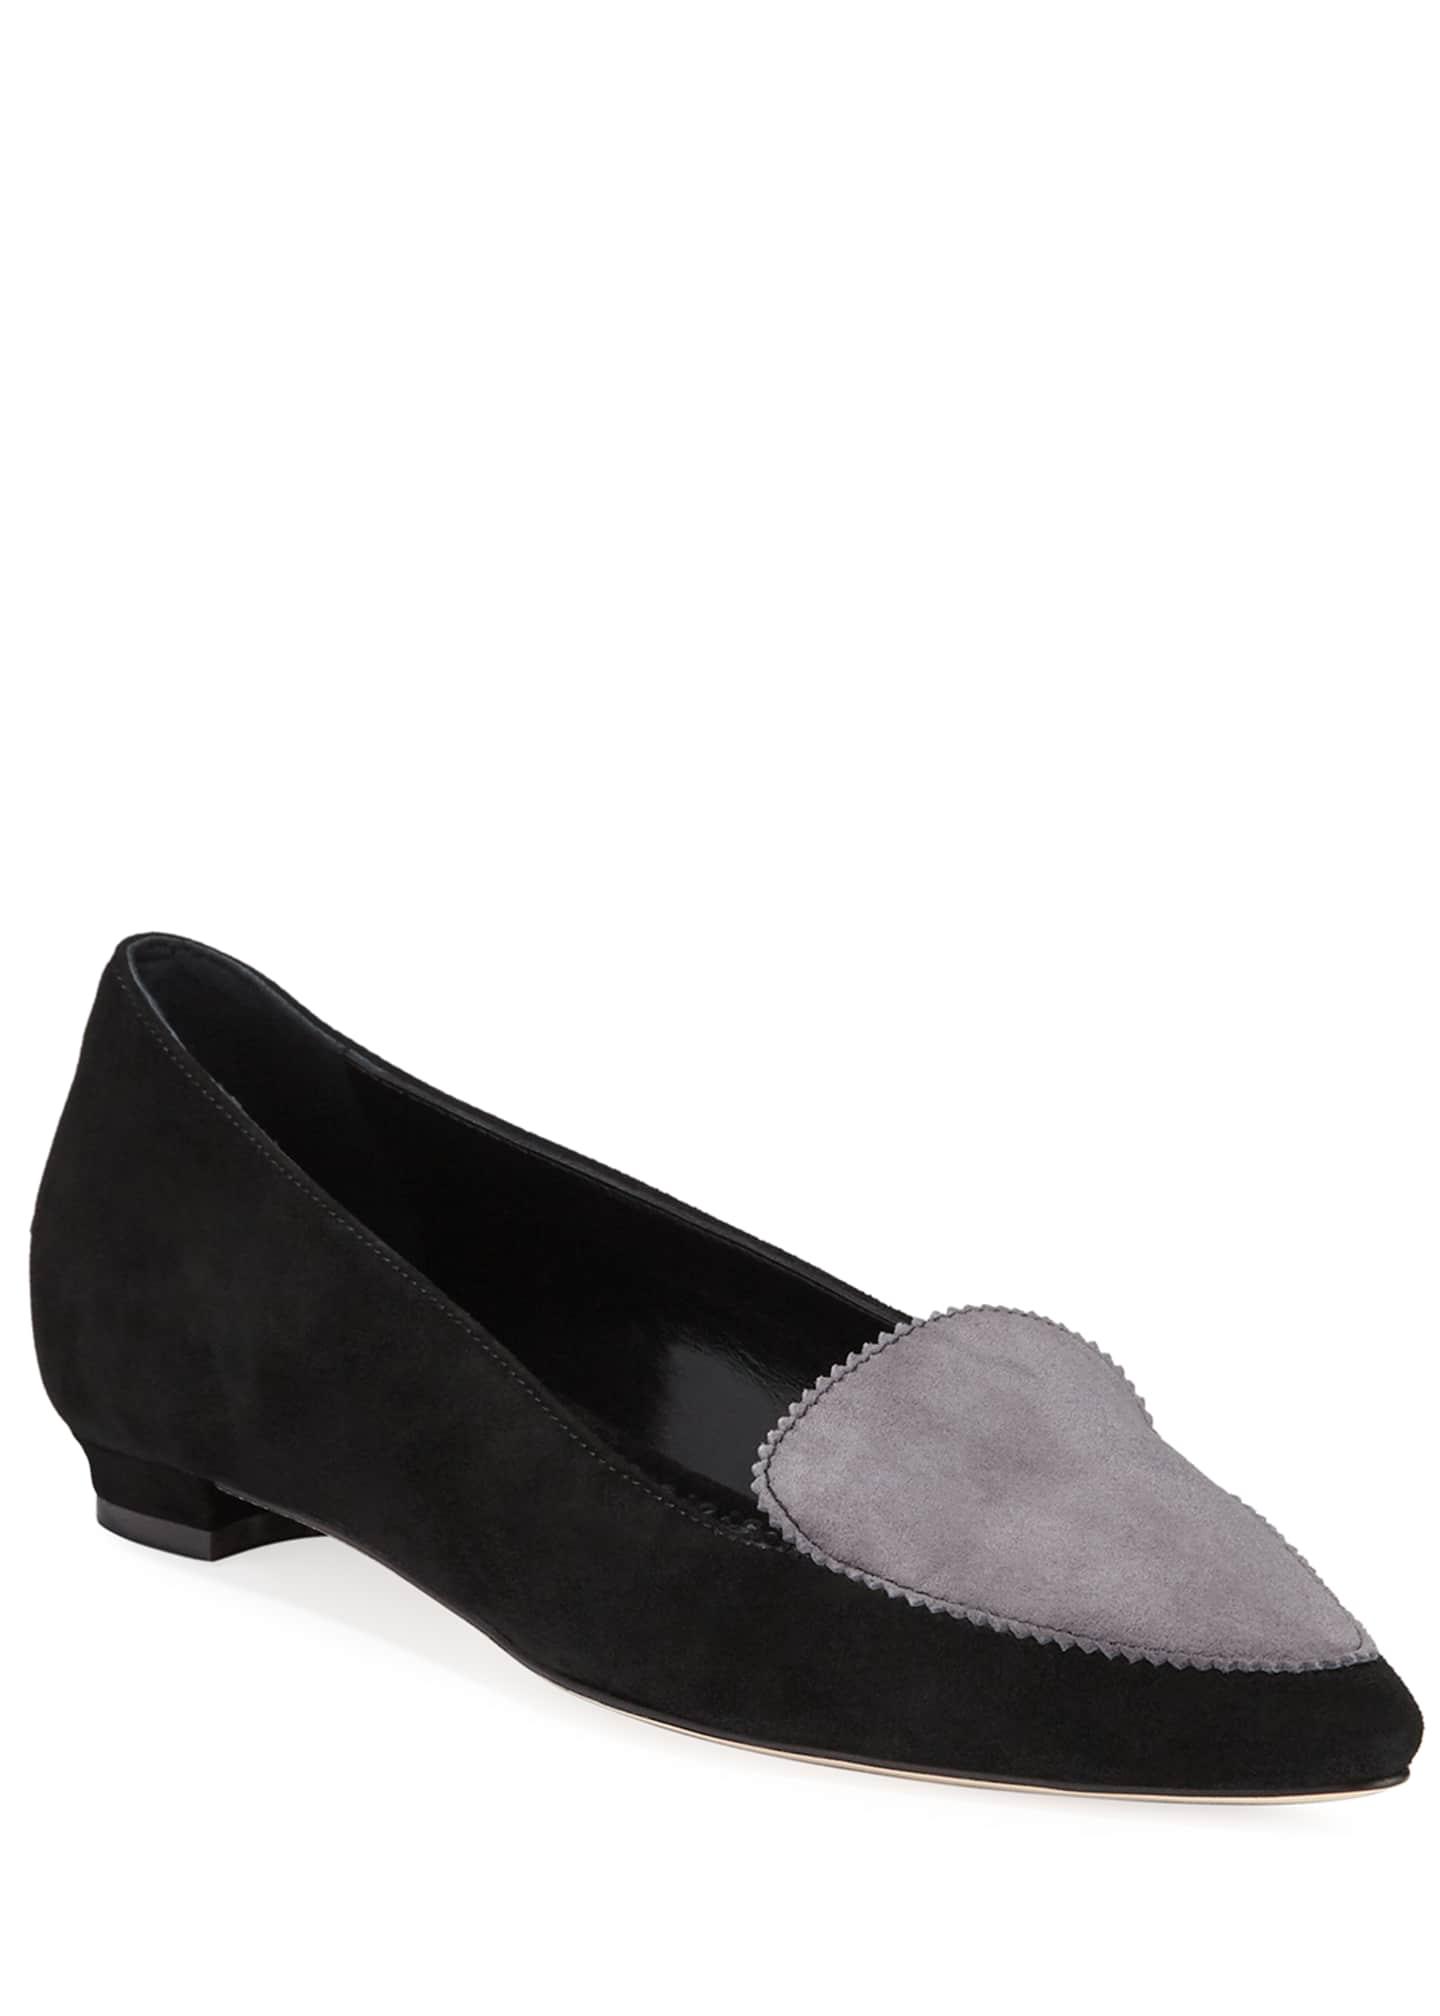 Manolo Blahnik Agos Two-Tone Suede Ballerina Flat Loafers